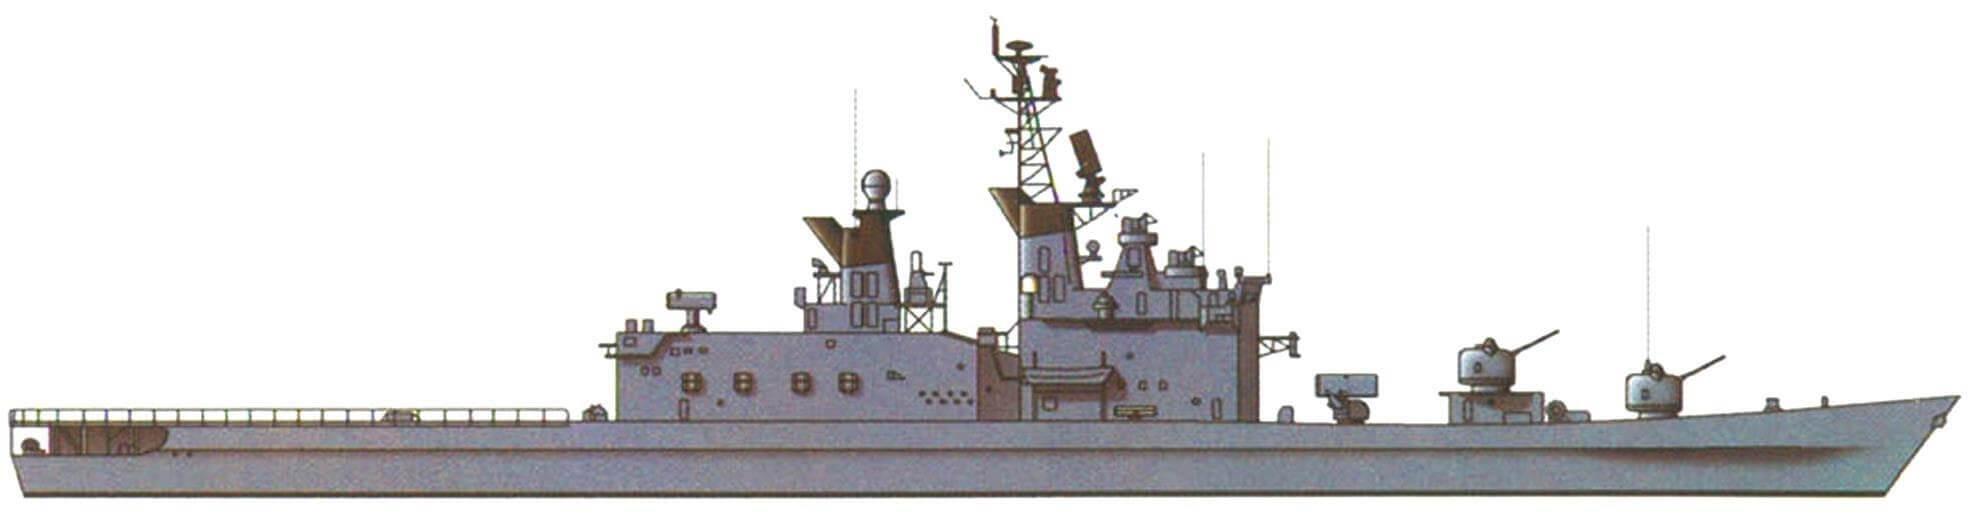 "Эсминец ""Сиранэ"", Япония, 1980 г."